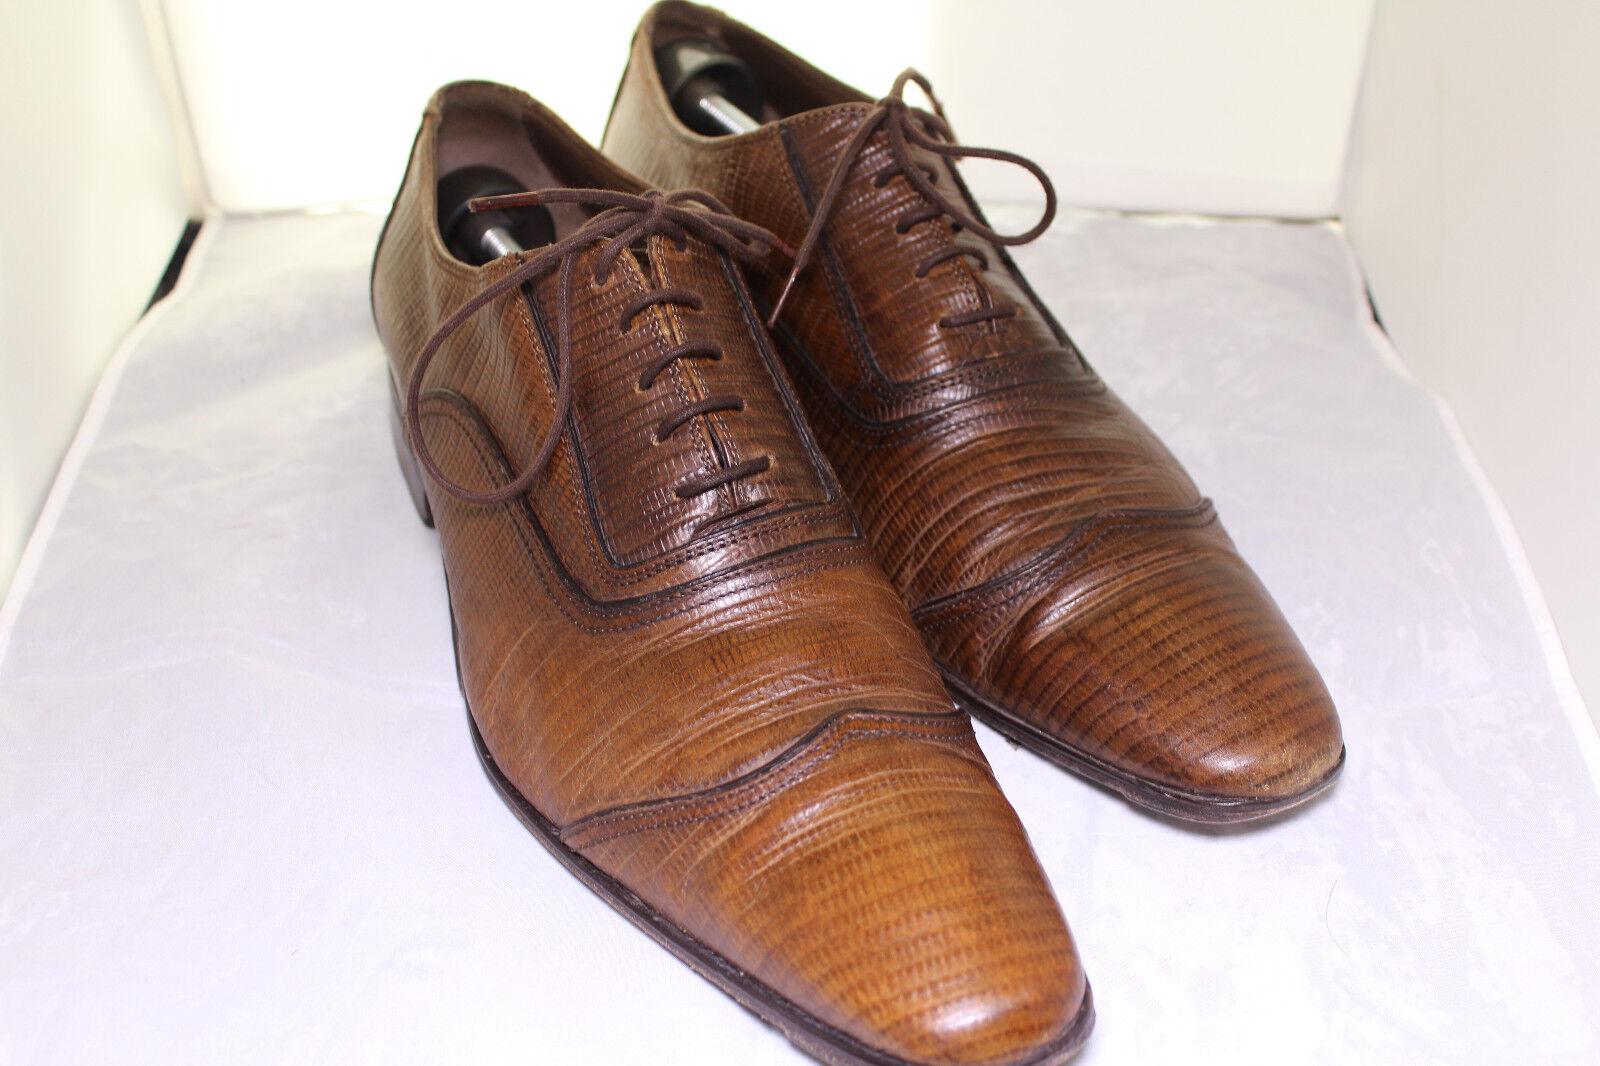 Zara Classico Marrone Scarpe in pelle Punta Ala Lucertola Stampa Oxford Sz 12 Eu